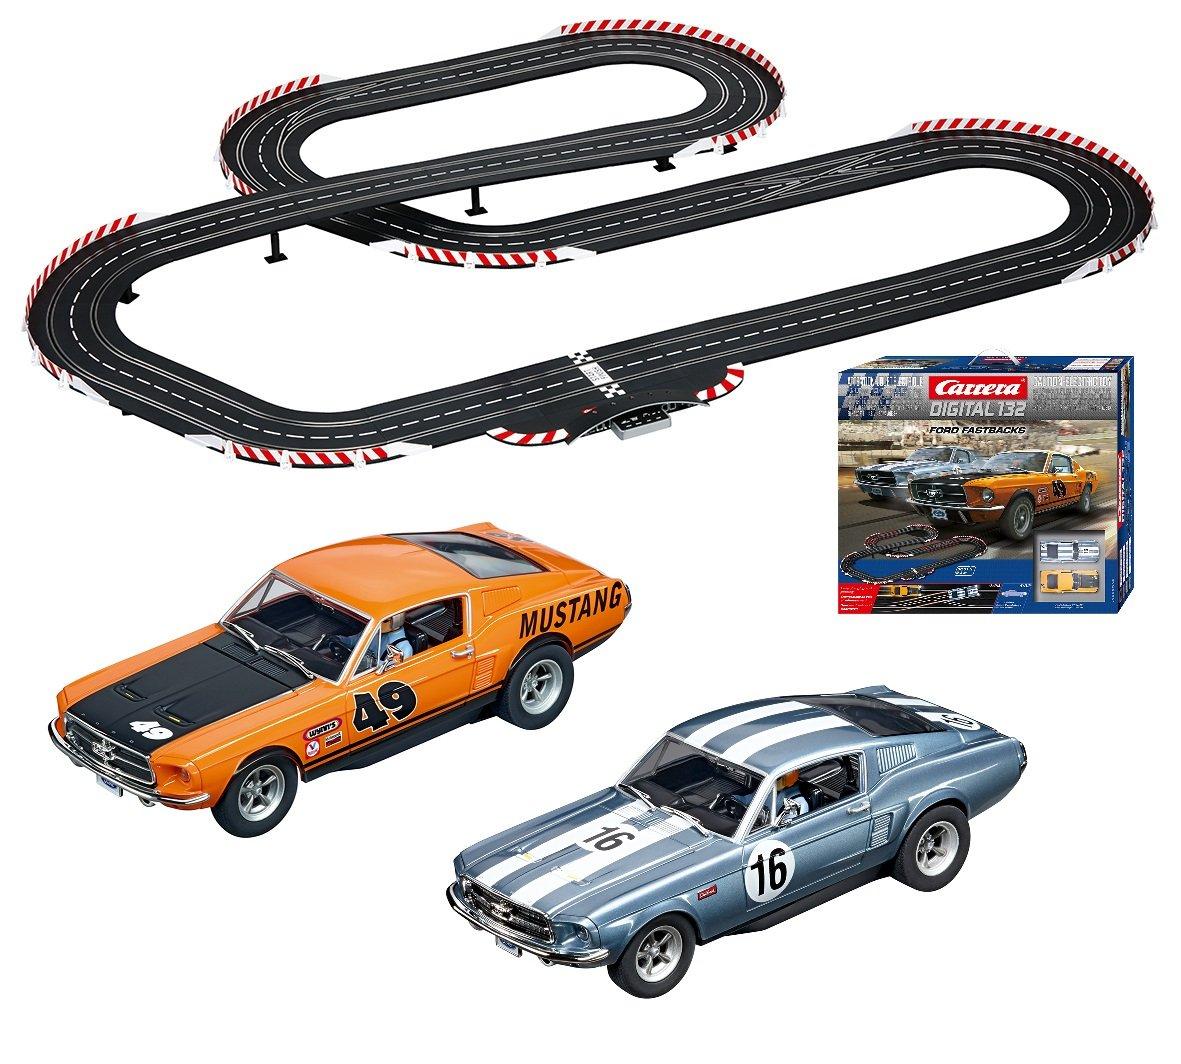 Carrera Digital 132 - Ford Fastbacks Digital Racetrack System